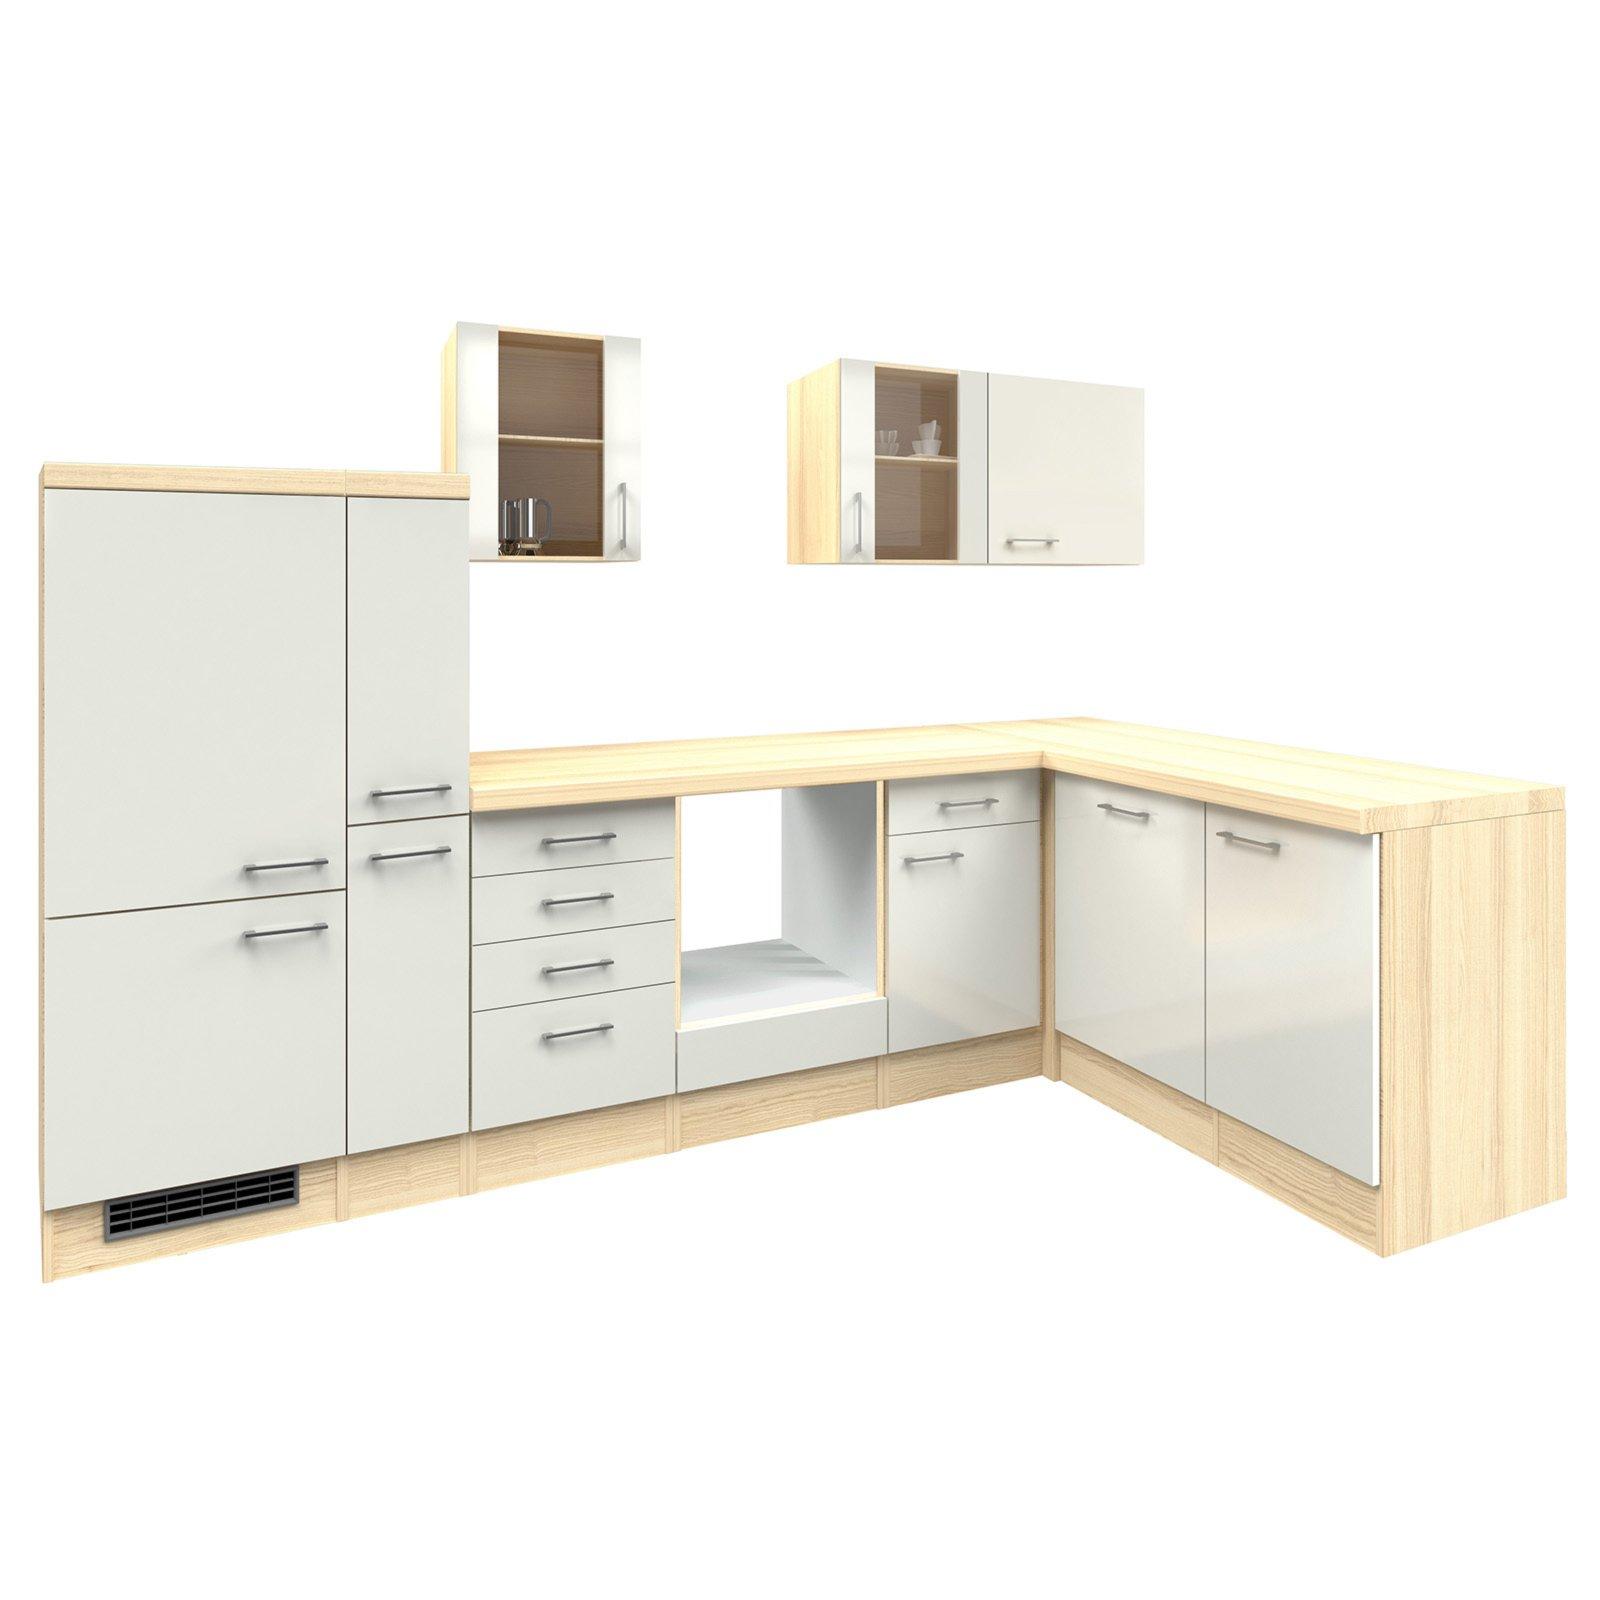 winkelk che abaco perlmutt akazie 310x170 cm. Black Bedroom Furniture Sets. Home Design Ideas